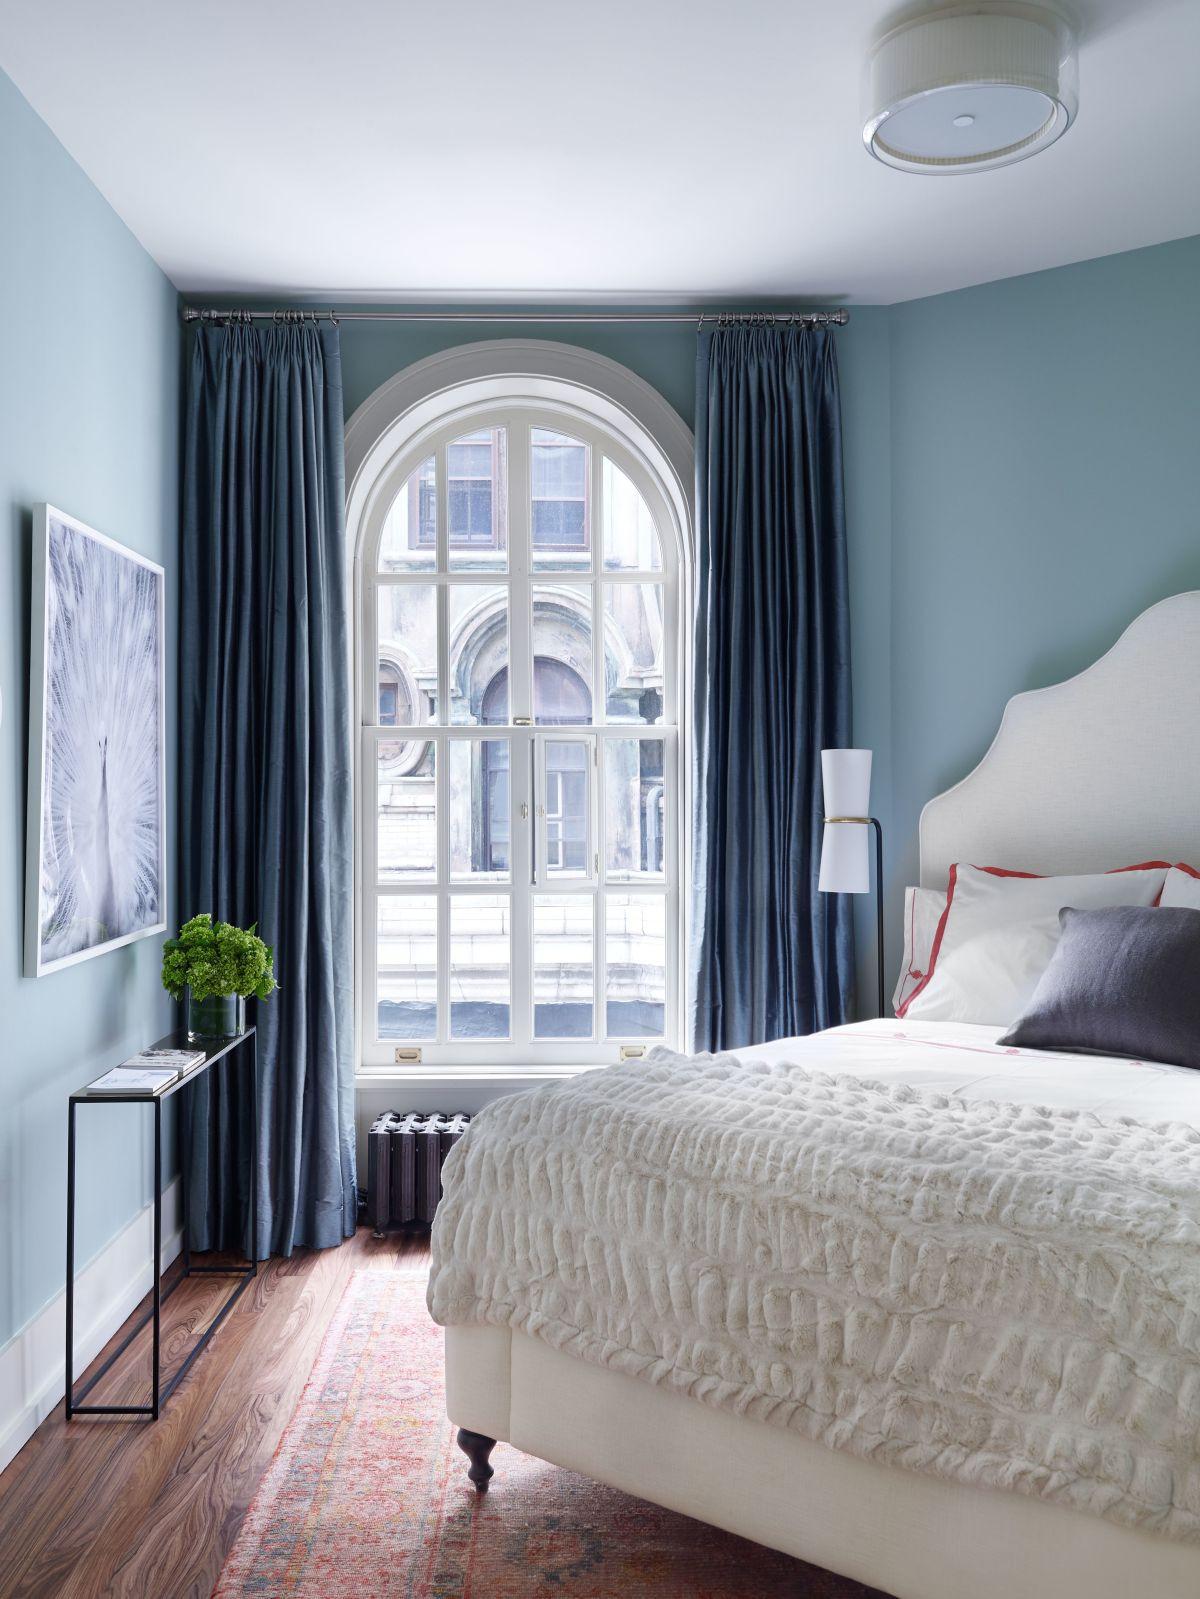 Best Color For Bedroom  9 Tricks Interior Decorators Won t Tell You KUKUN